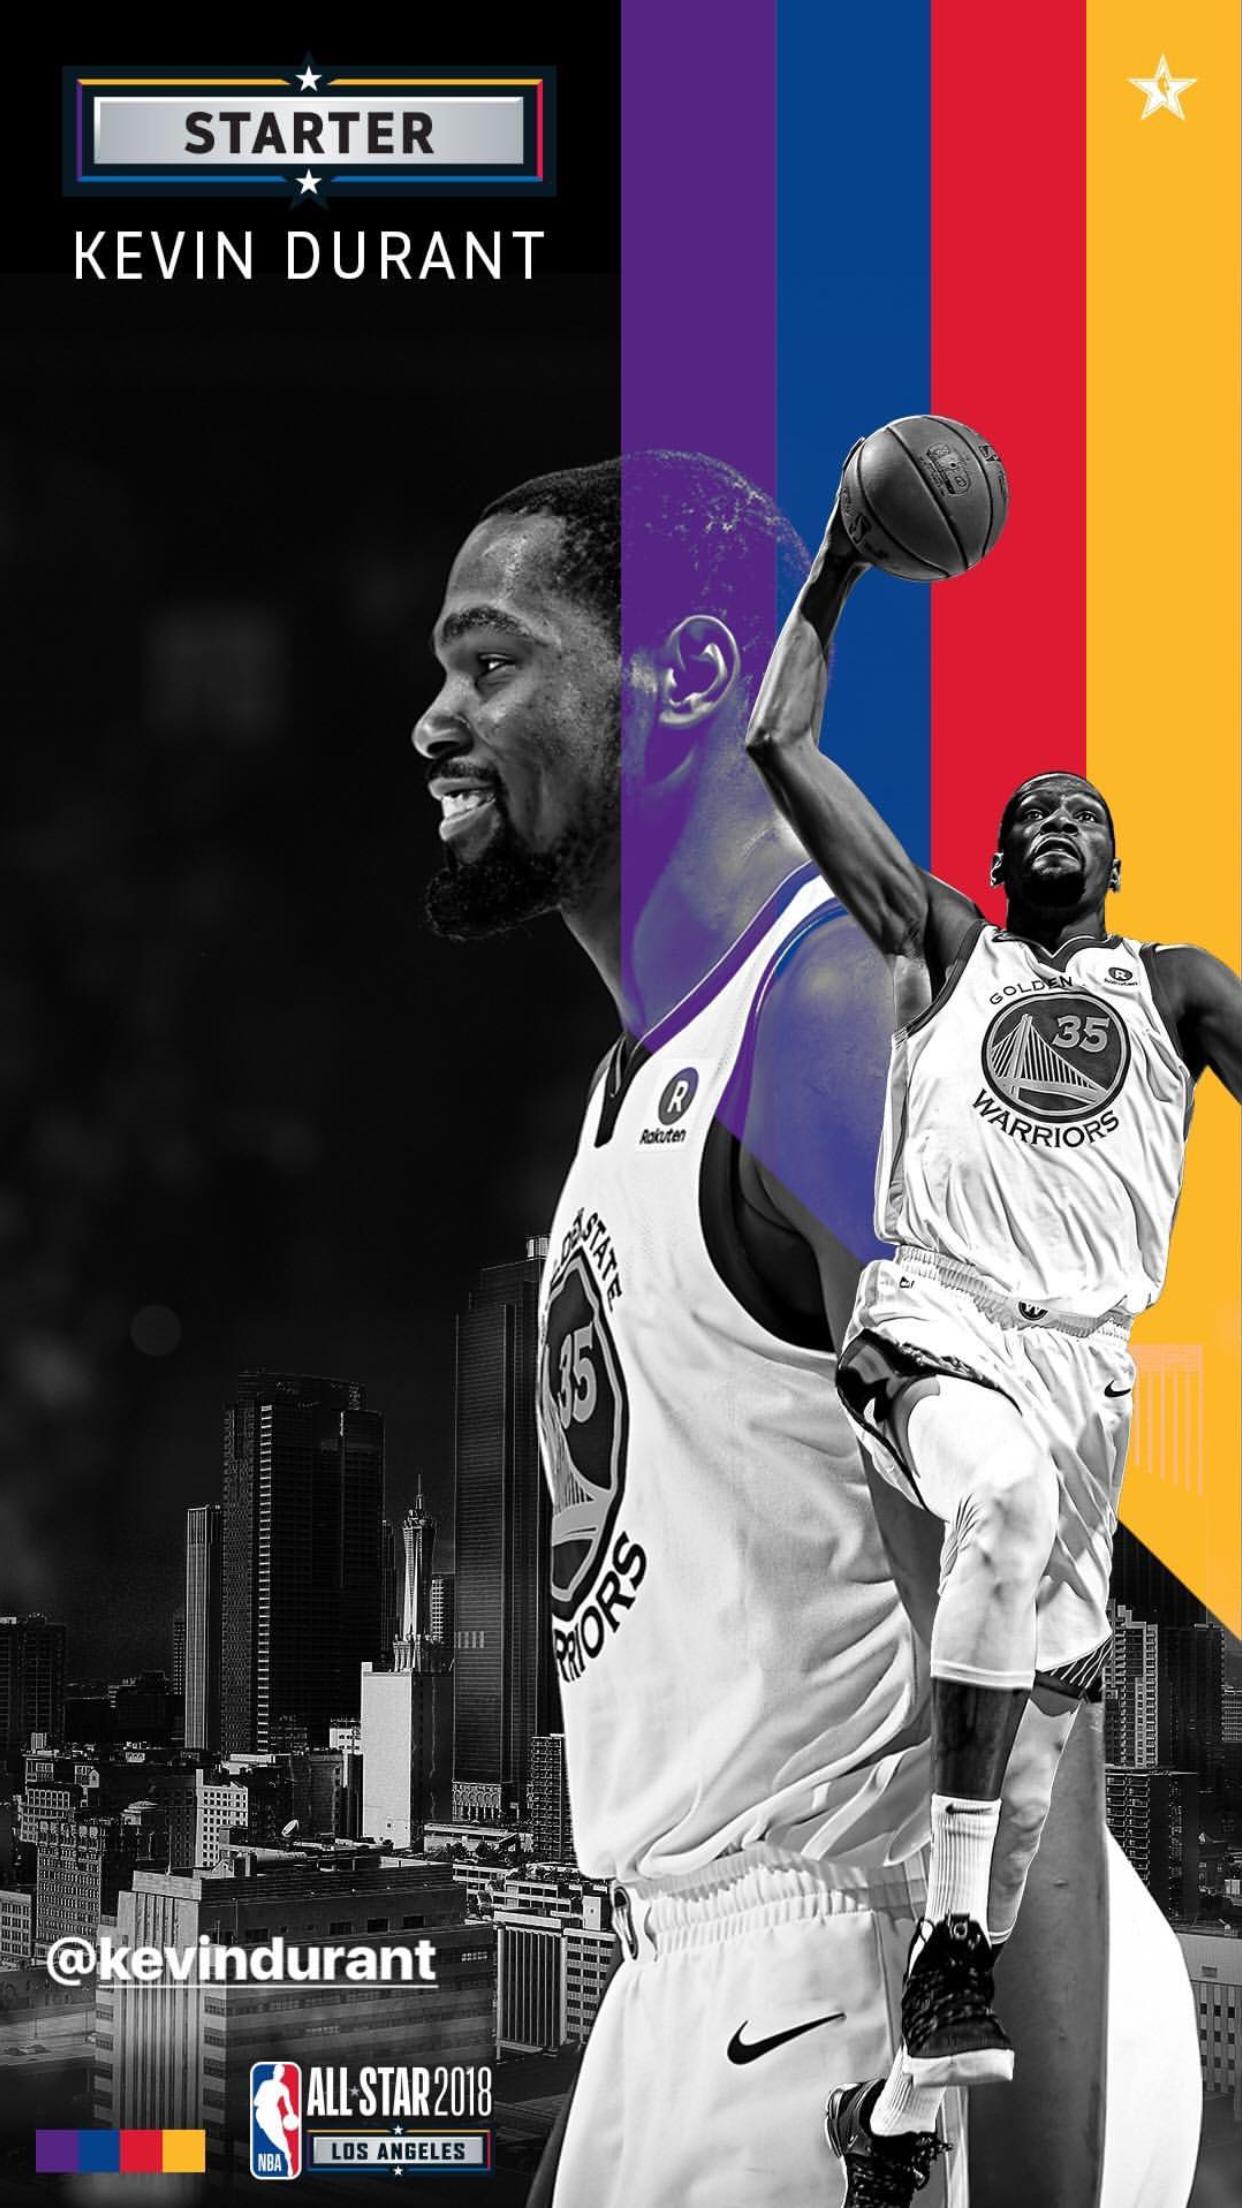 Durant Nba Kevin Durant Warriors Basketball Golden State Warriors Basketball